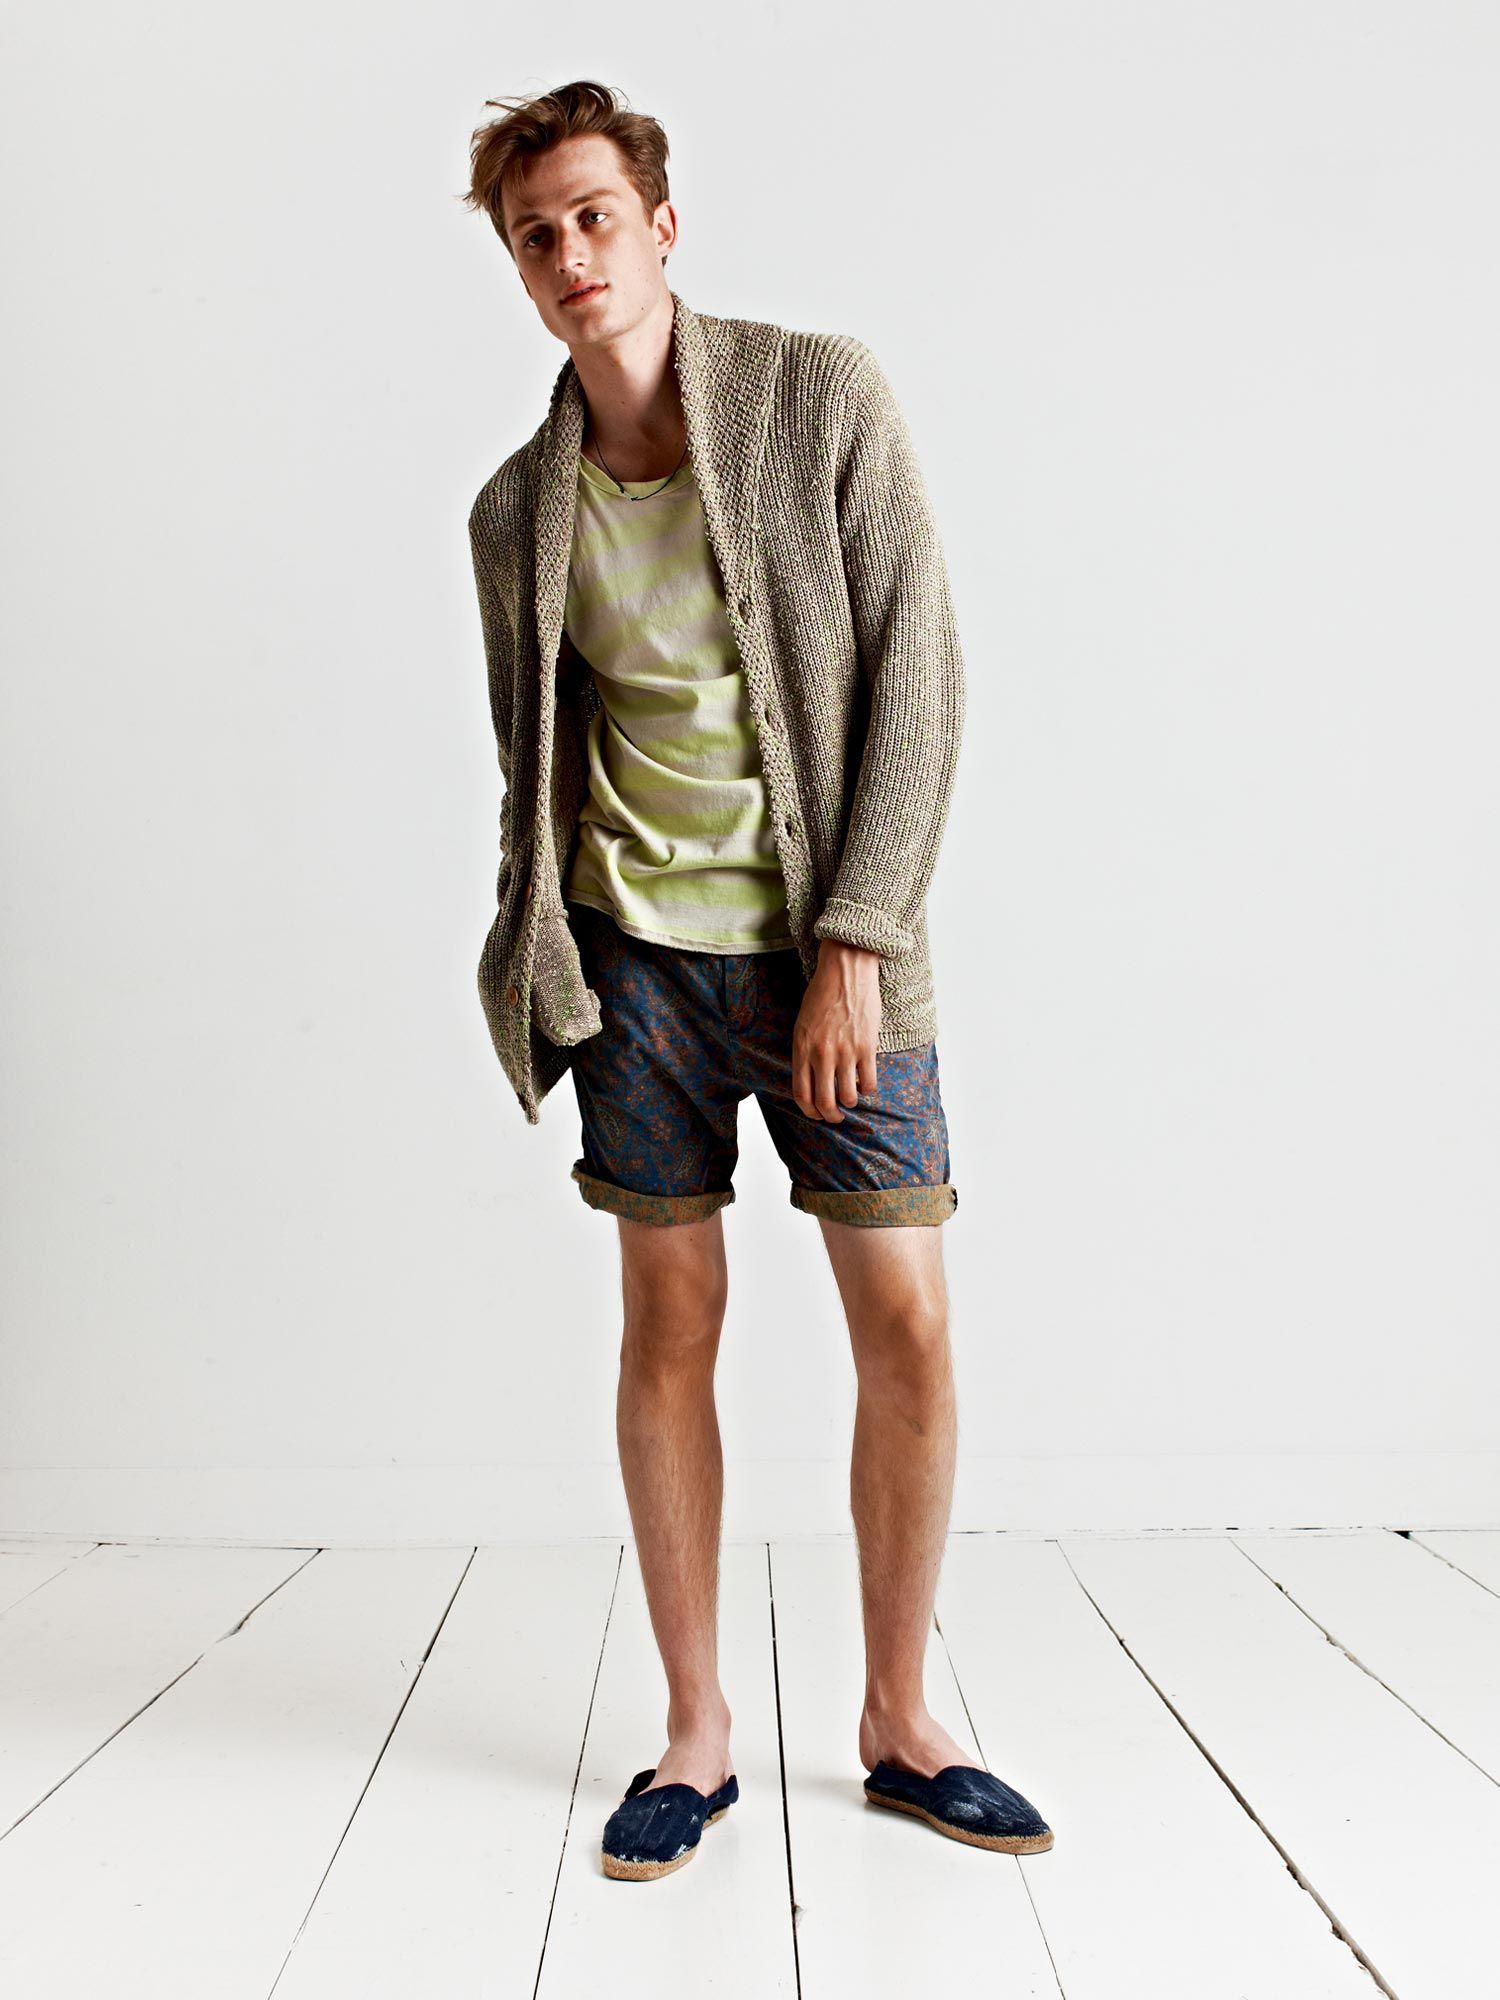 Hipster guy fashion summer dresses